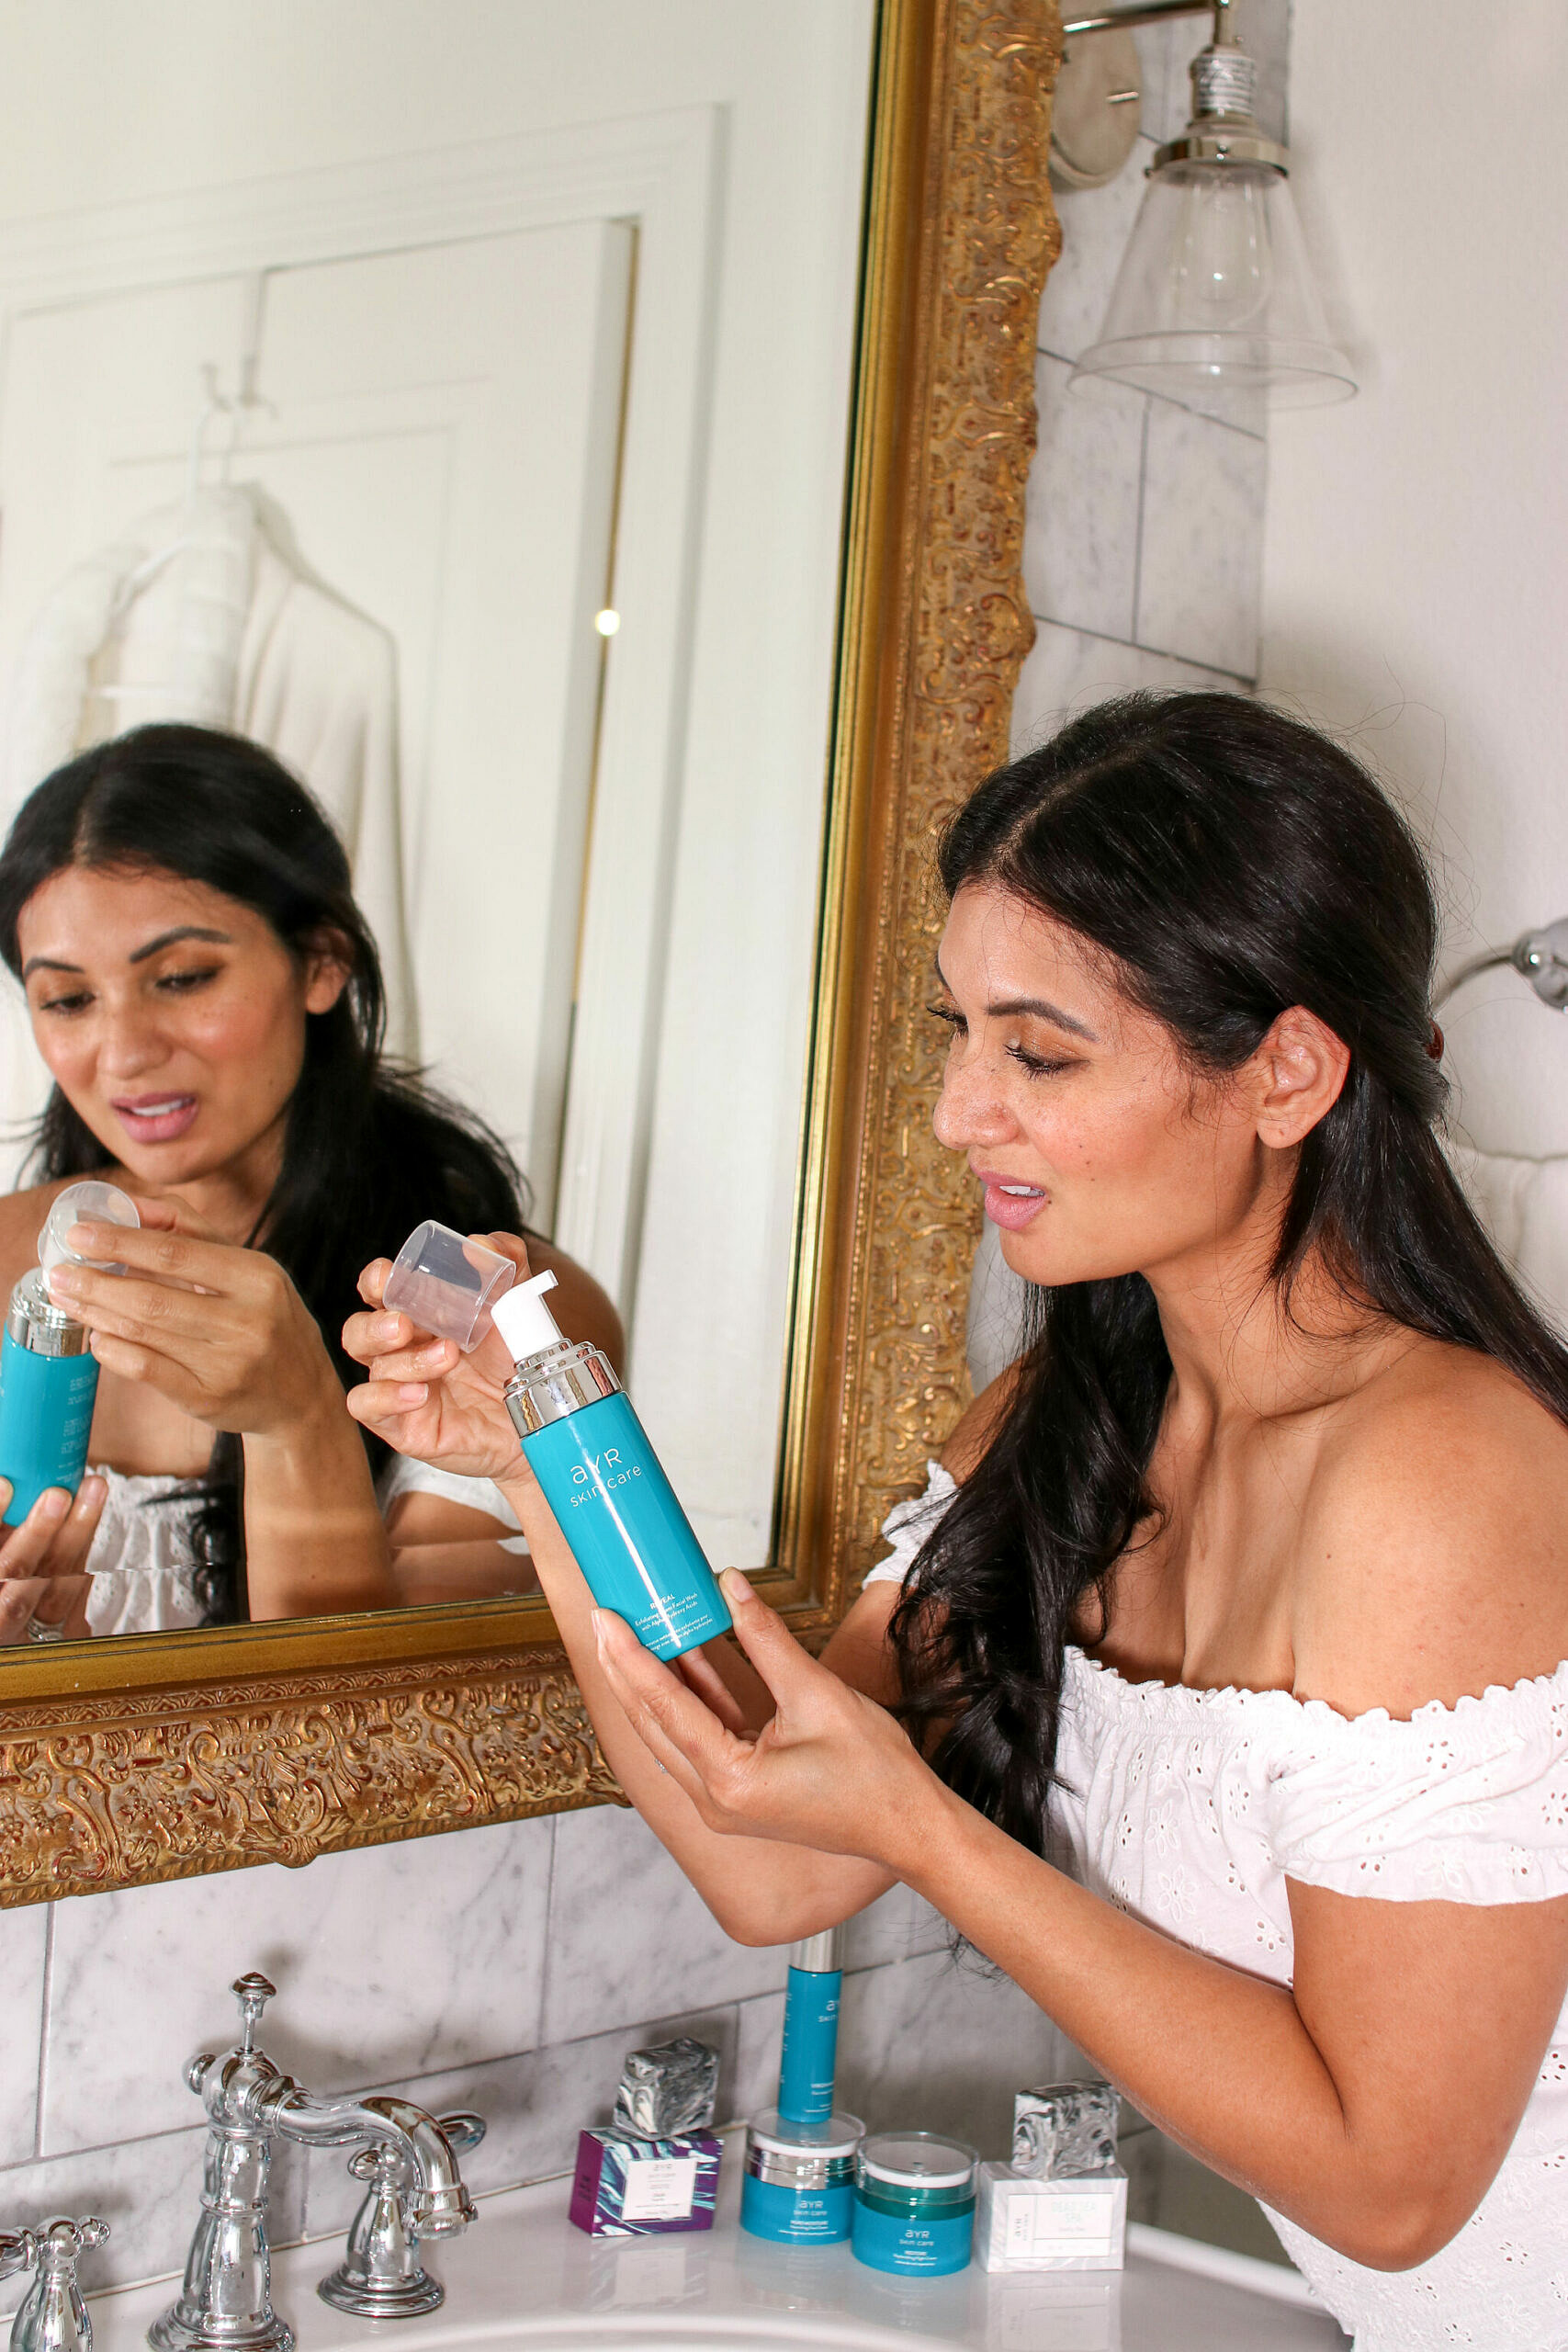 Reveal Gentle Exfoliating Foam Facial Wash with Alpha Hydroxy Acids